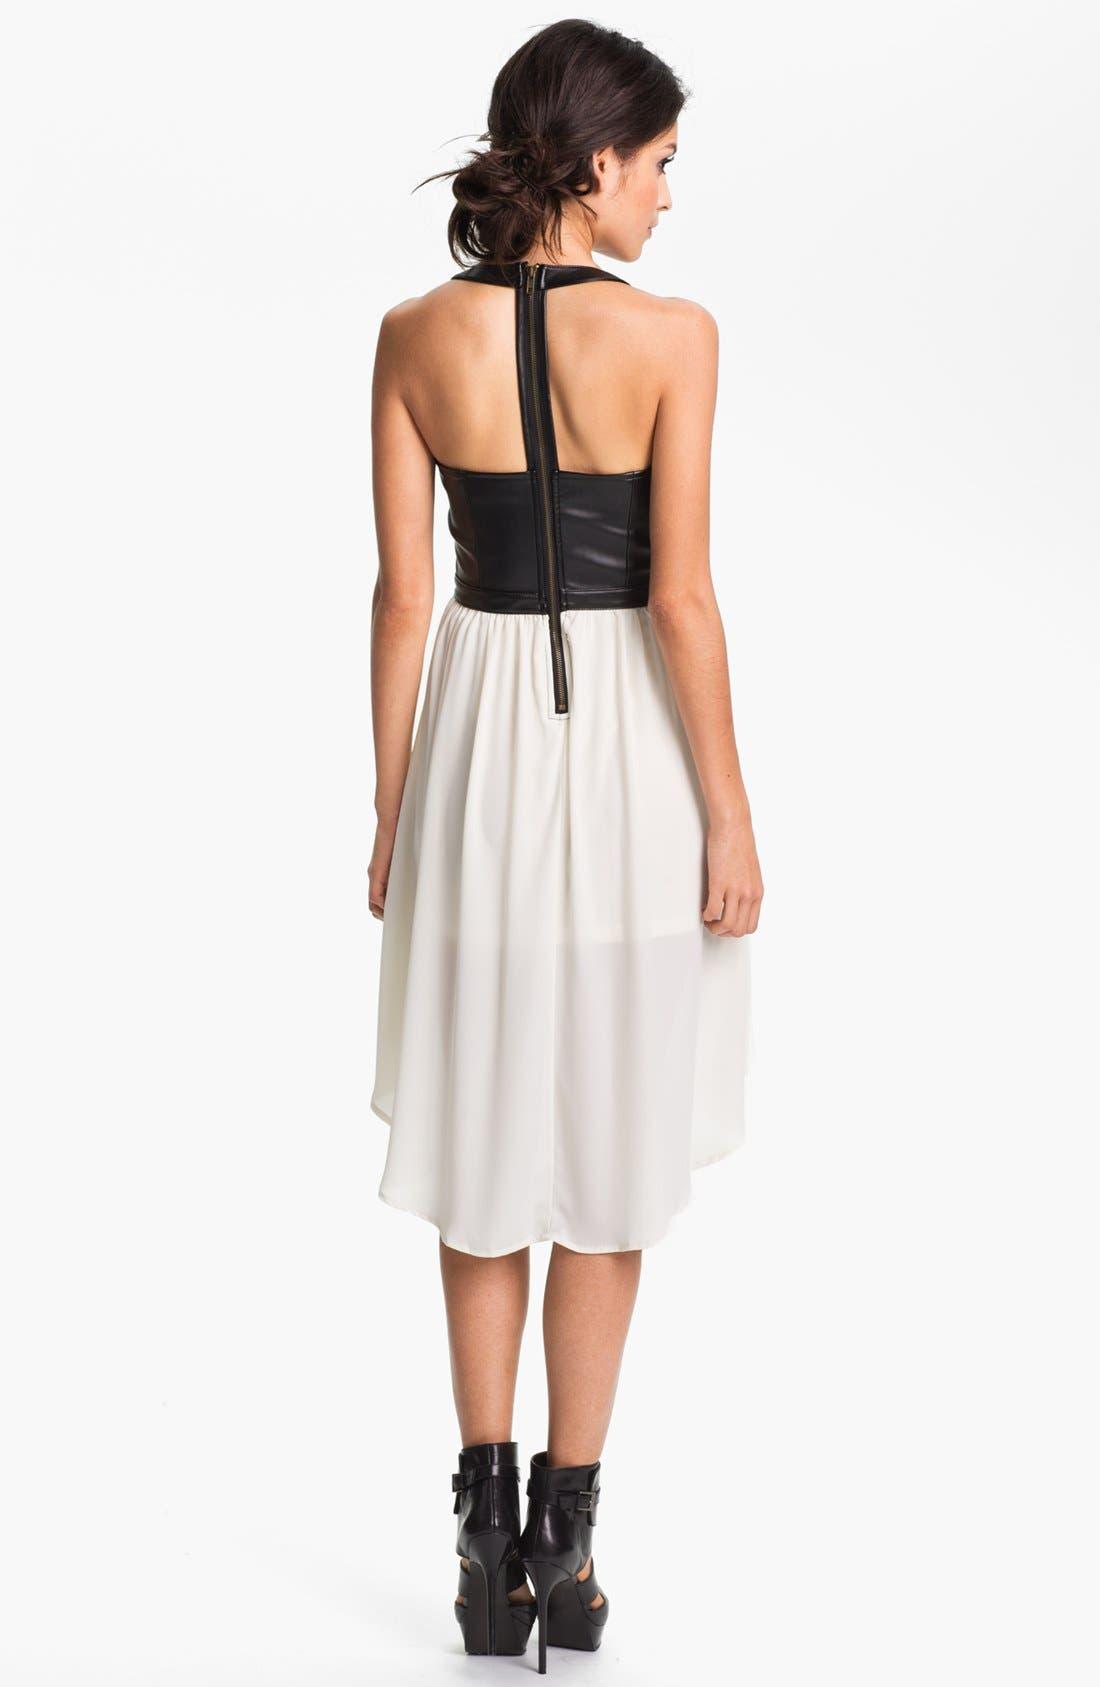 Alternate Image 2  - Lush Clothing Cutout Faux Leather Bustier Dress (Juniors)